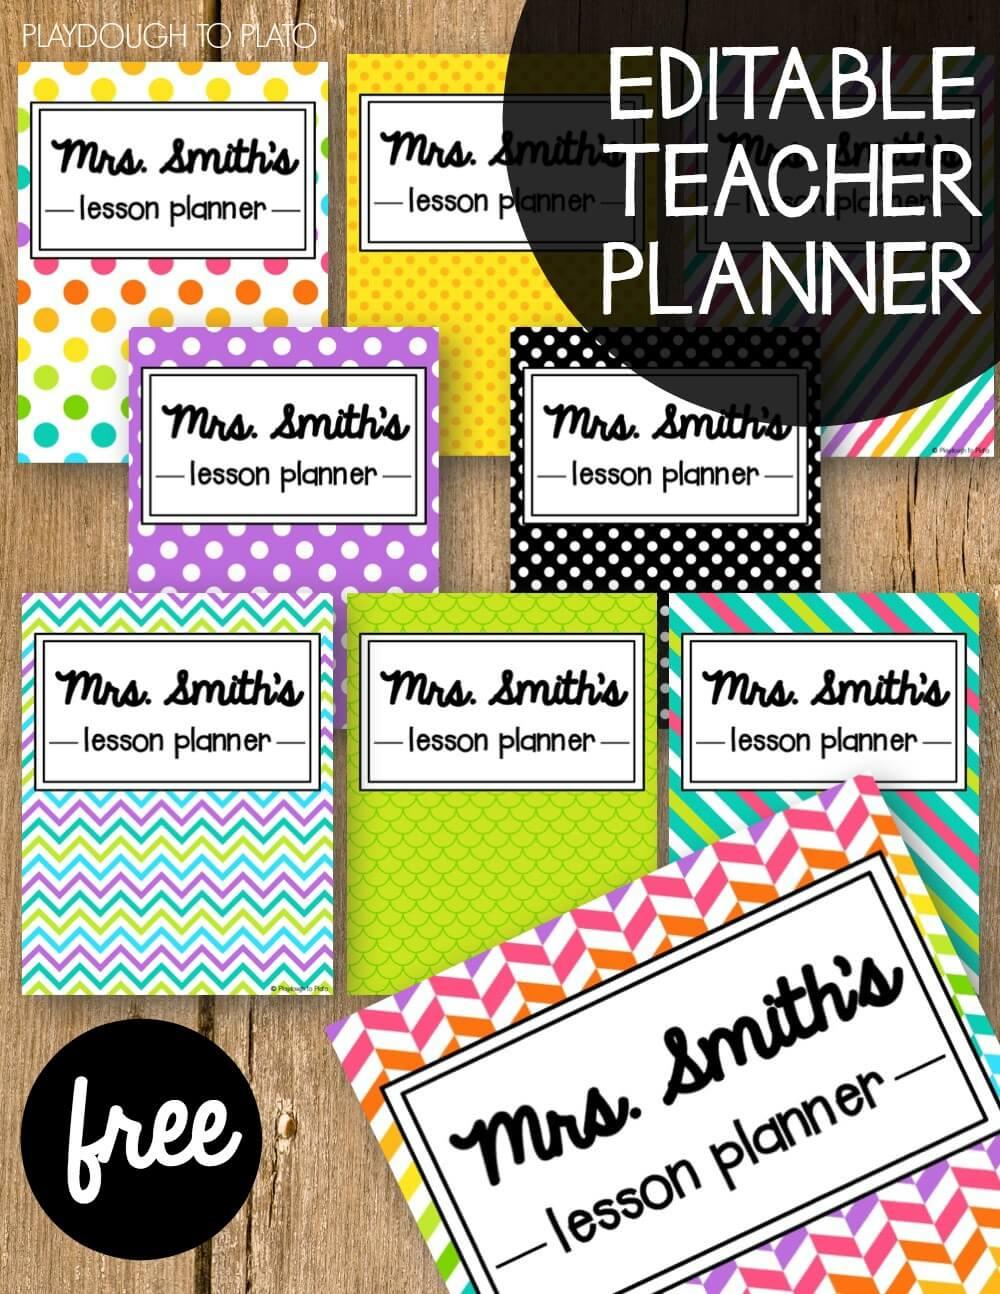 Free Teacher Planner - Playdough To Plato - Printable Teacher Planner Free